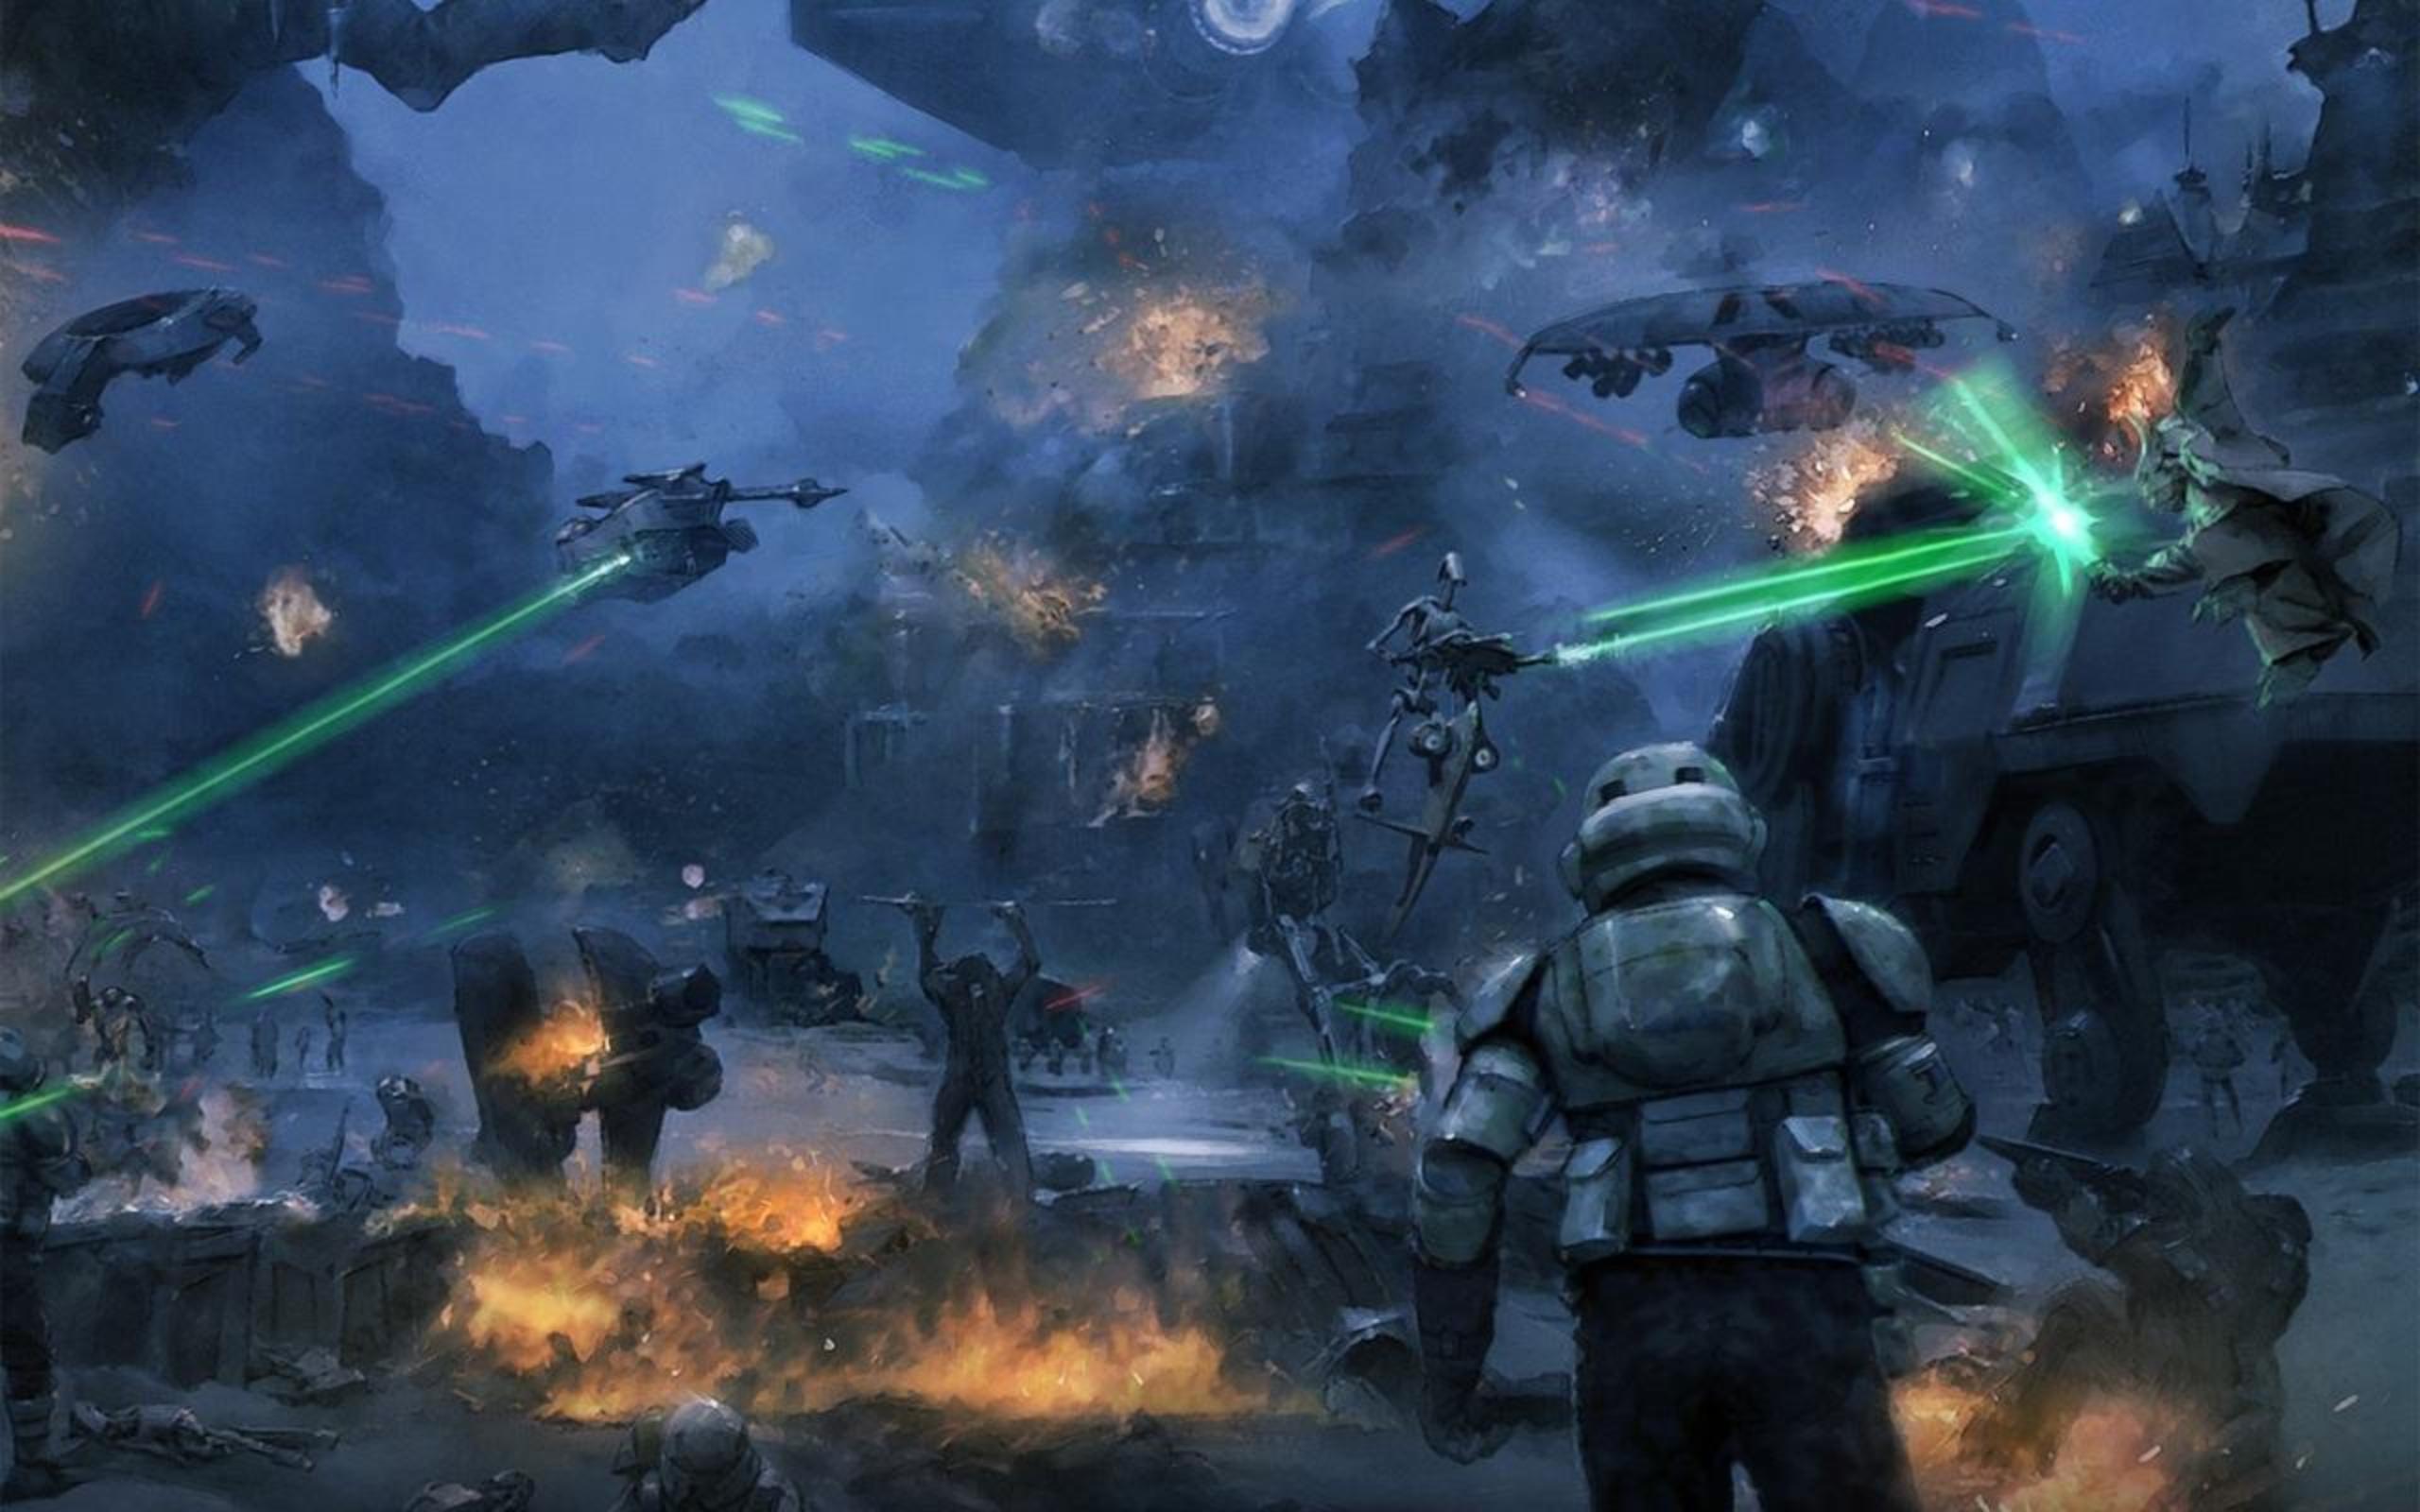 The Battle of Kashyyyk 25601600   Star Wars Wallpaper 25176070 2560x1600